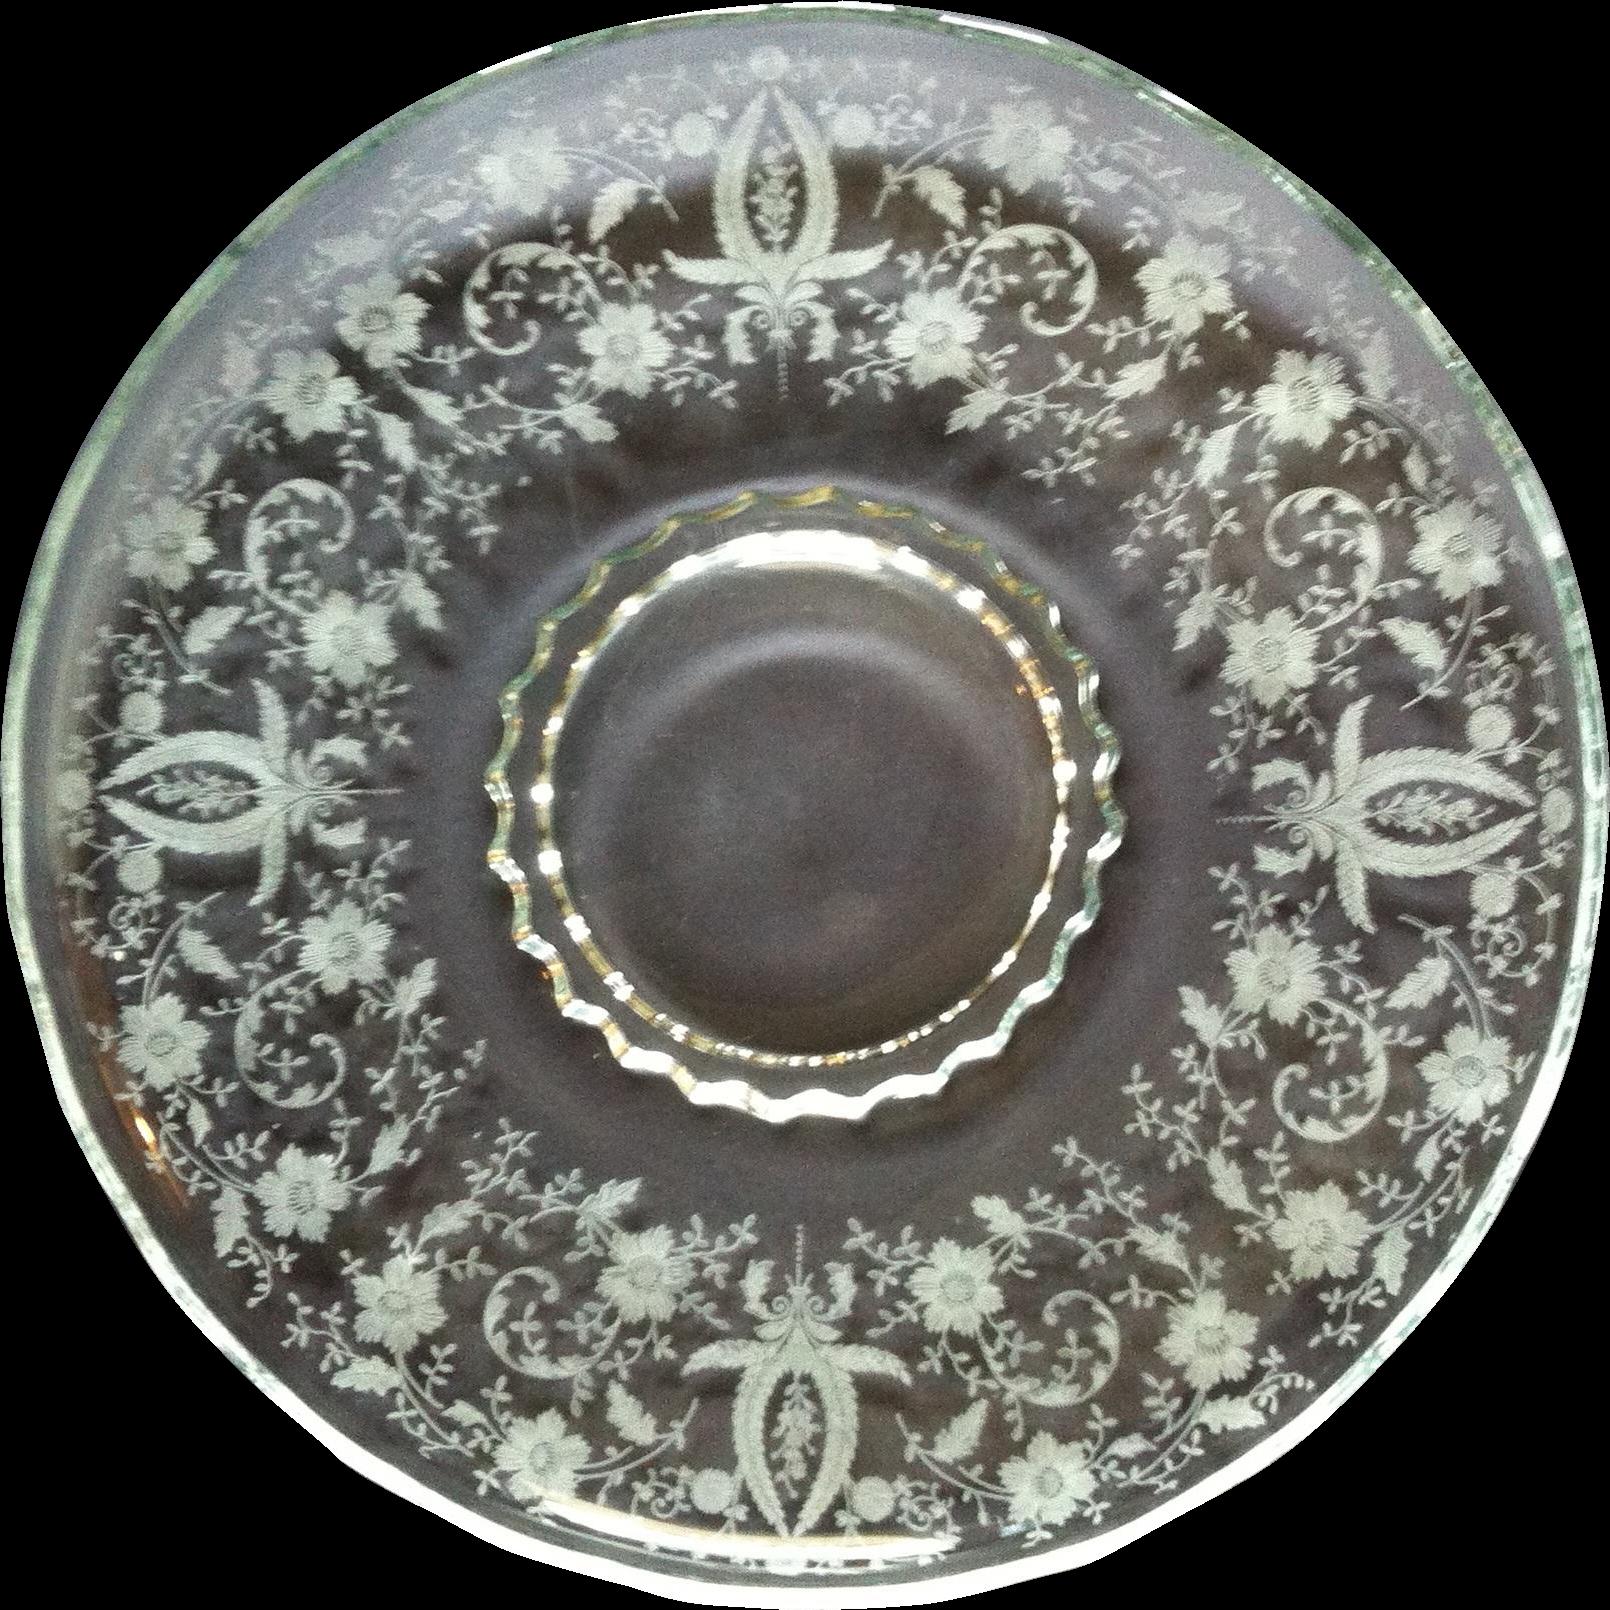 Viking Glass Prelude Sandwich/ Torte Platter